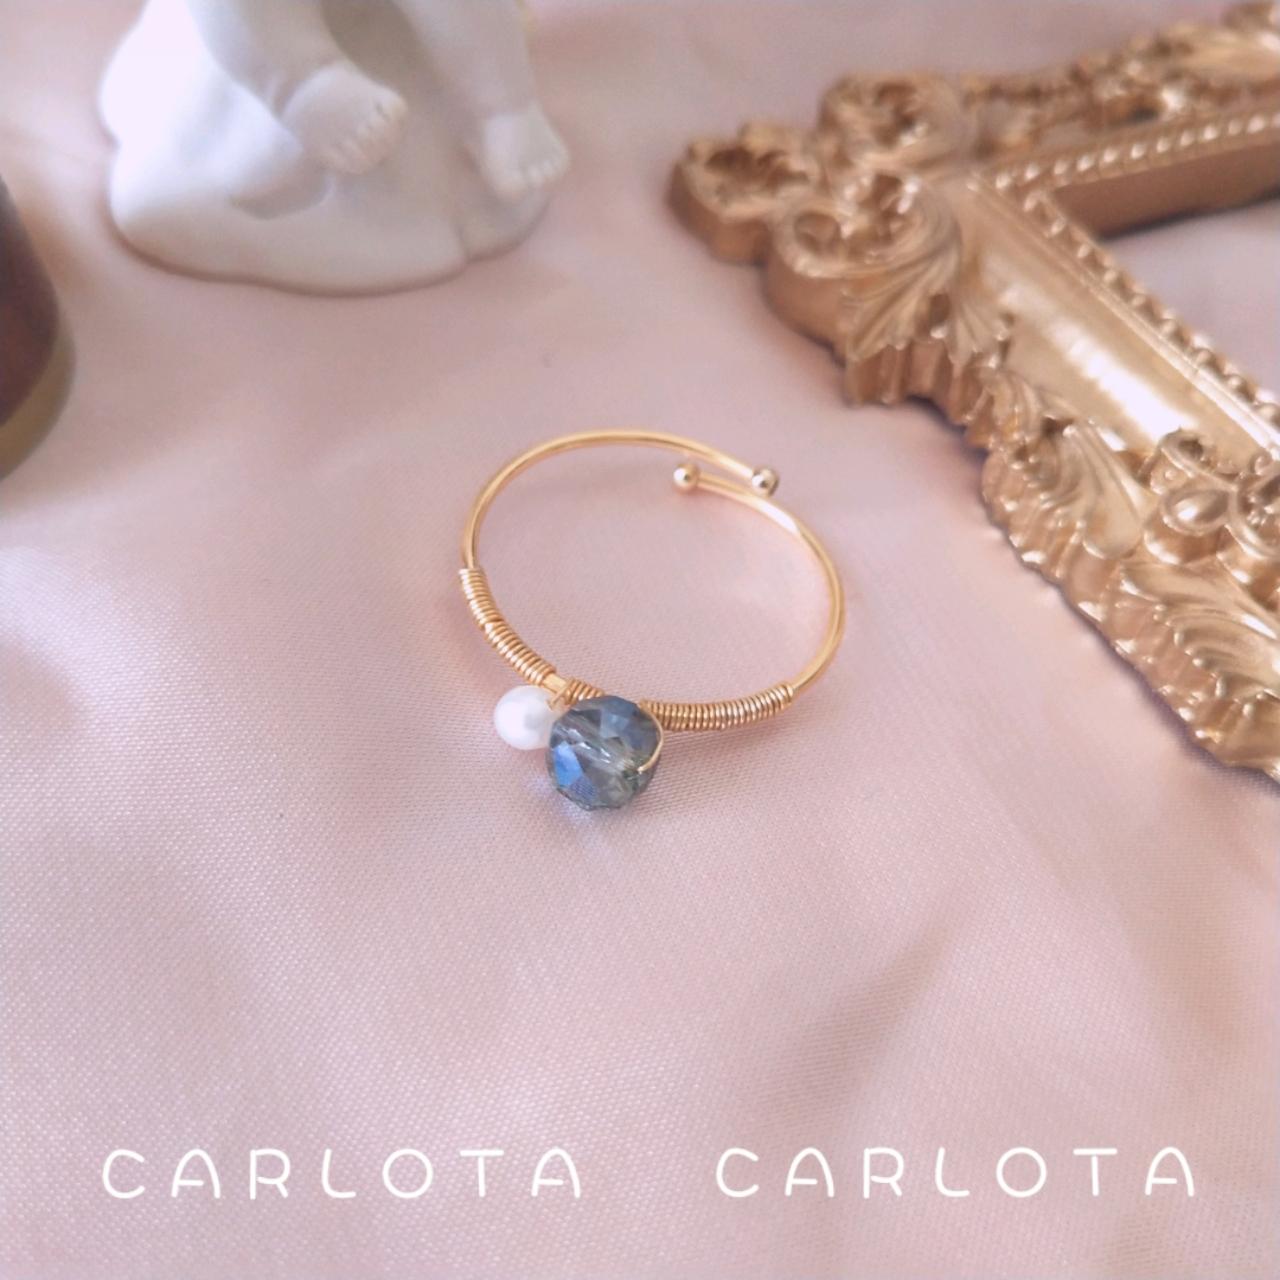 CARLOTA*法式原创仙气甜美金戒指开口可调节天然珍珠施家水晶指环